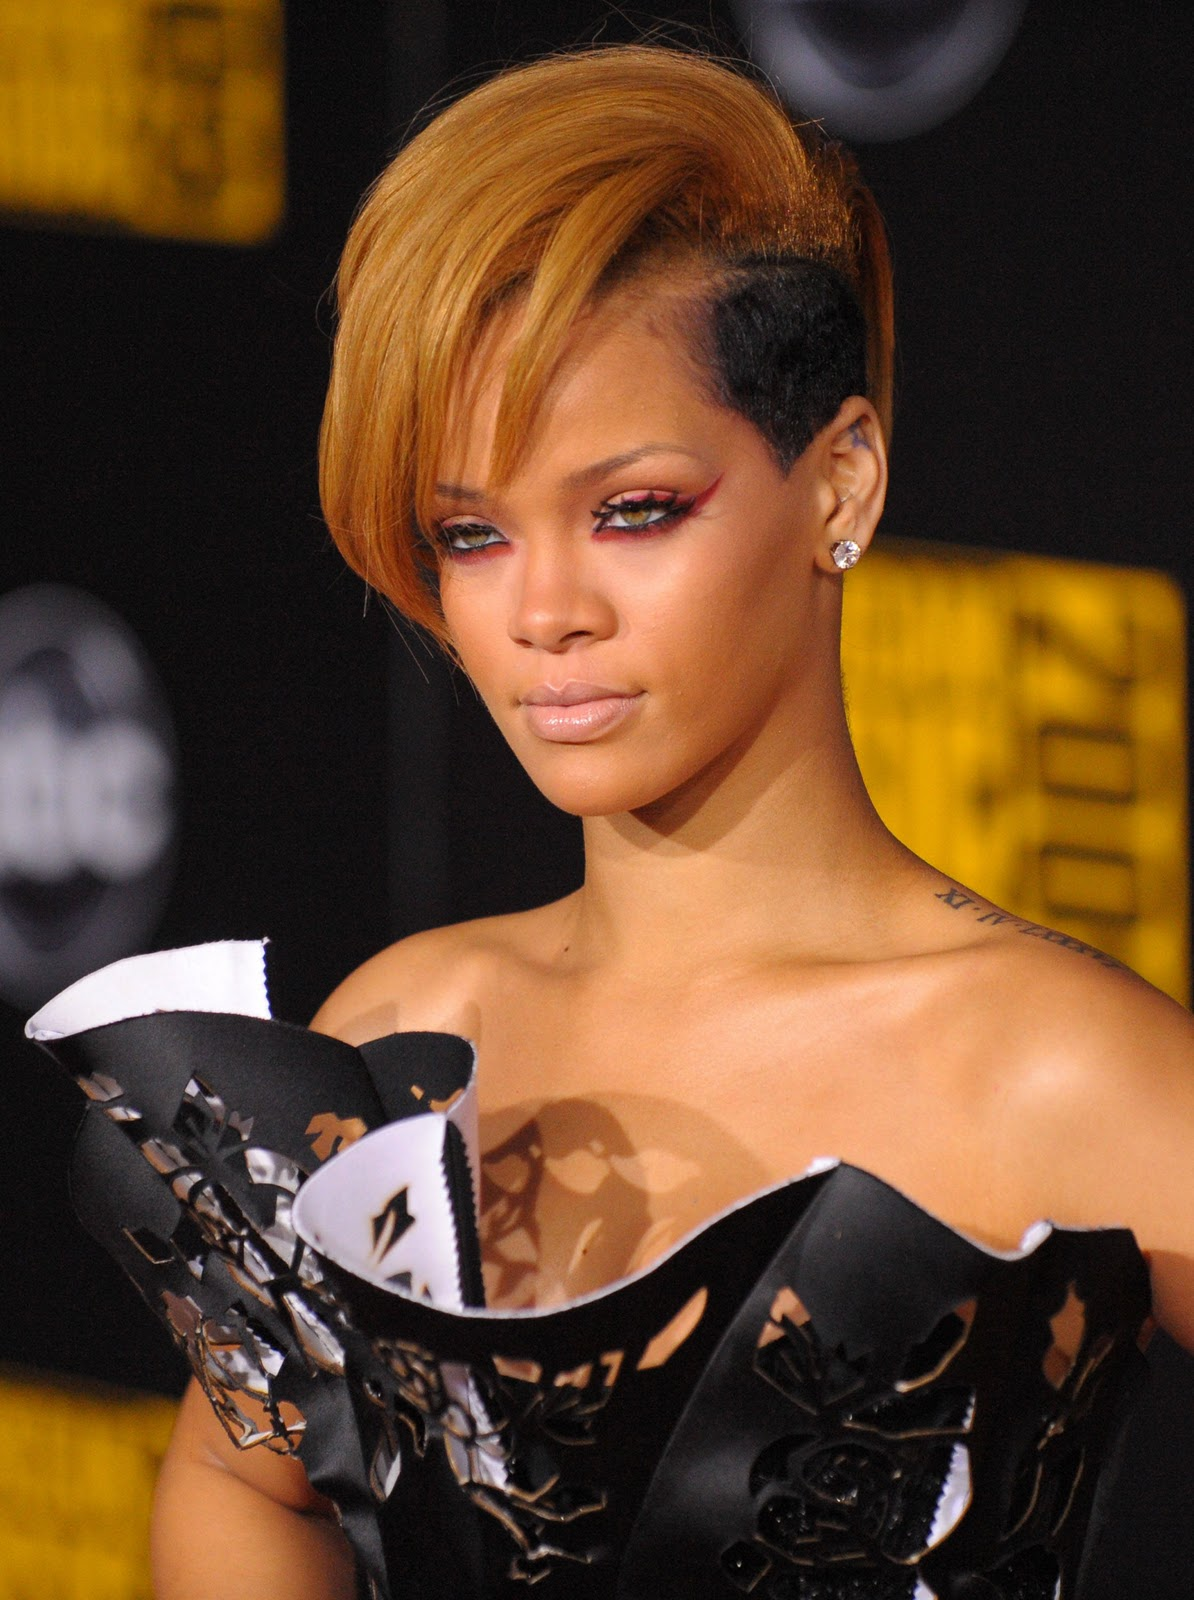 http://3.bp.blogspot.com/-9Srbb3zv6pM/TpQ89qXpoGI/AAAAAAAAEC0/YBXF8u3tdBU/s1600/rihanna+hairstyles+%25287%2529.jpg